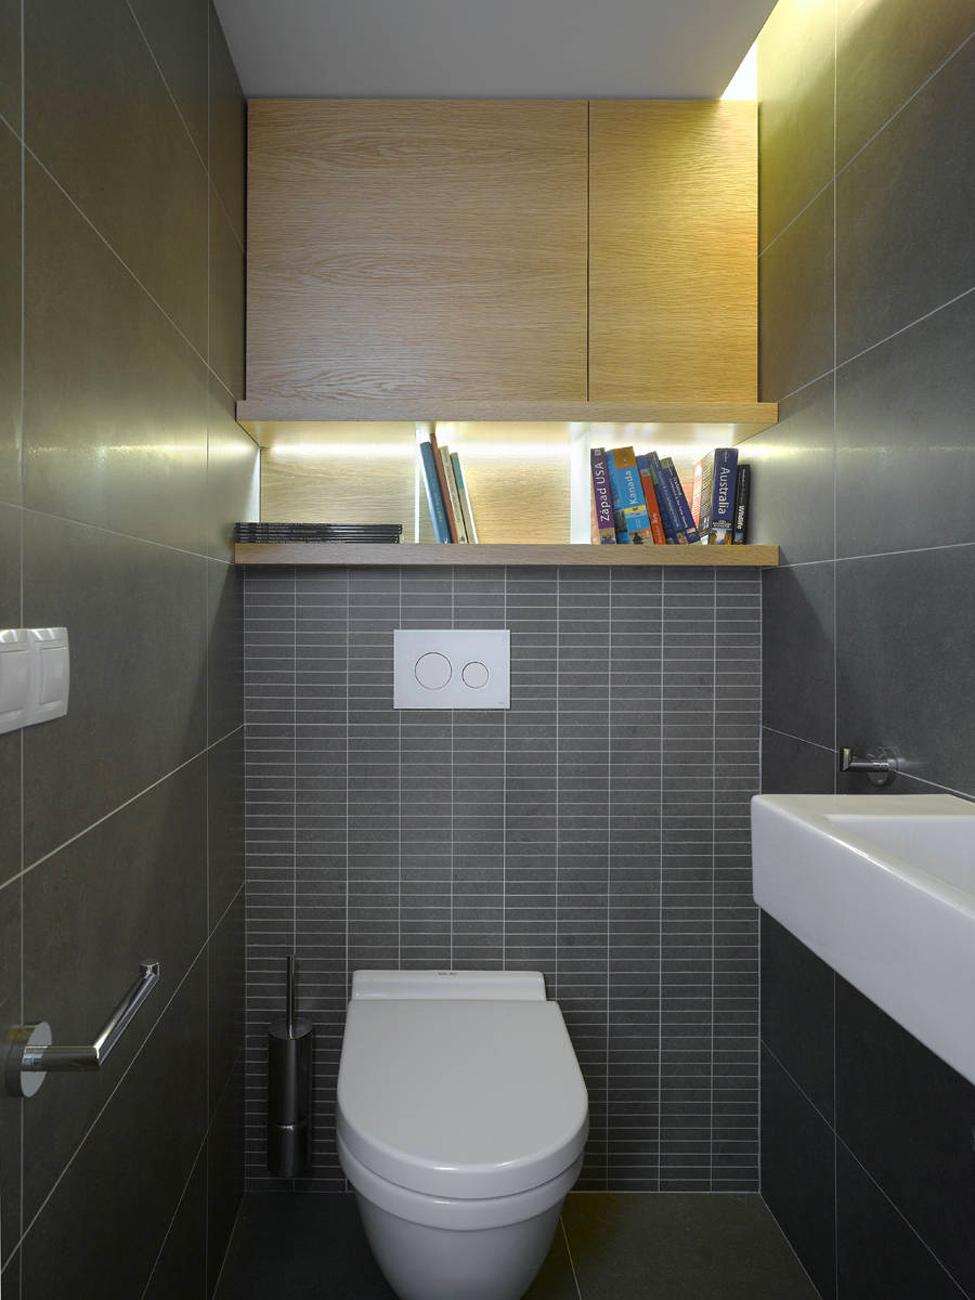 Интерьер туалета в квартире хрущевка